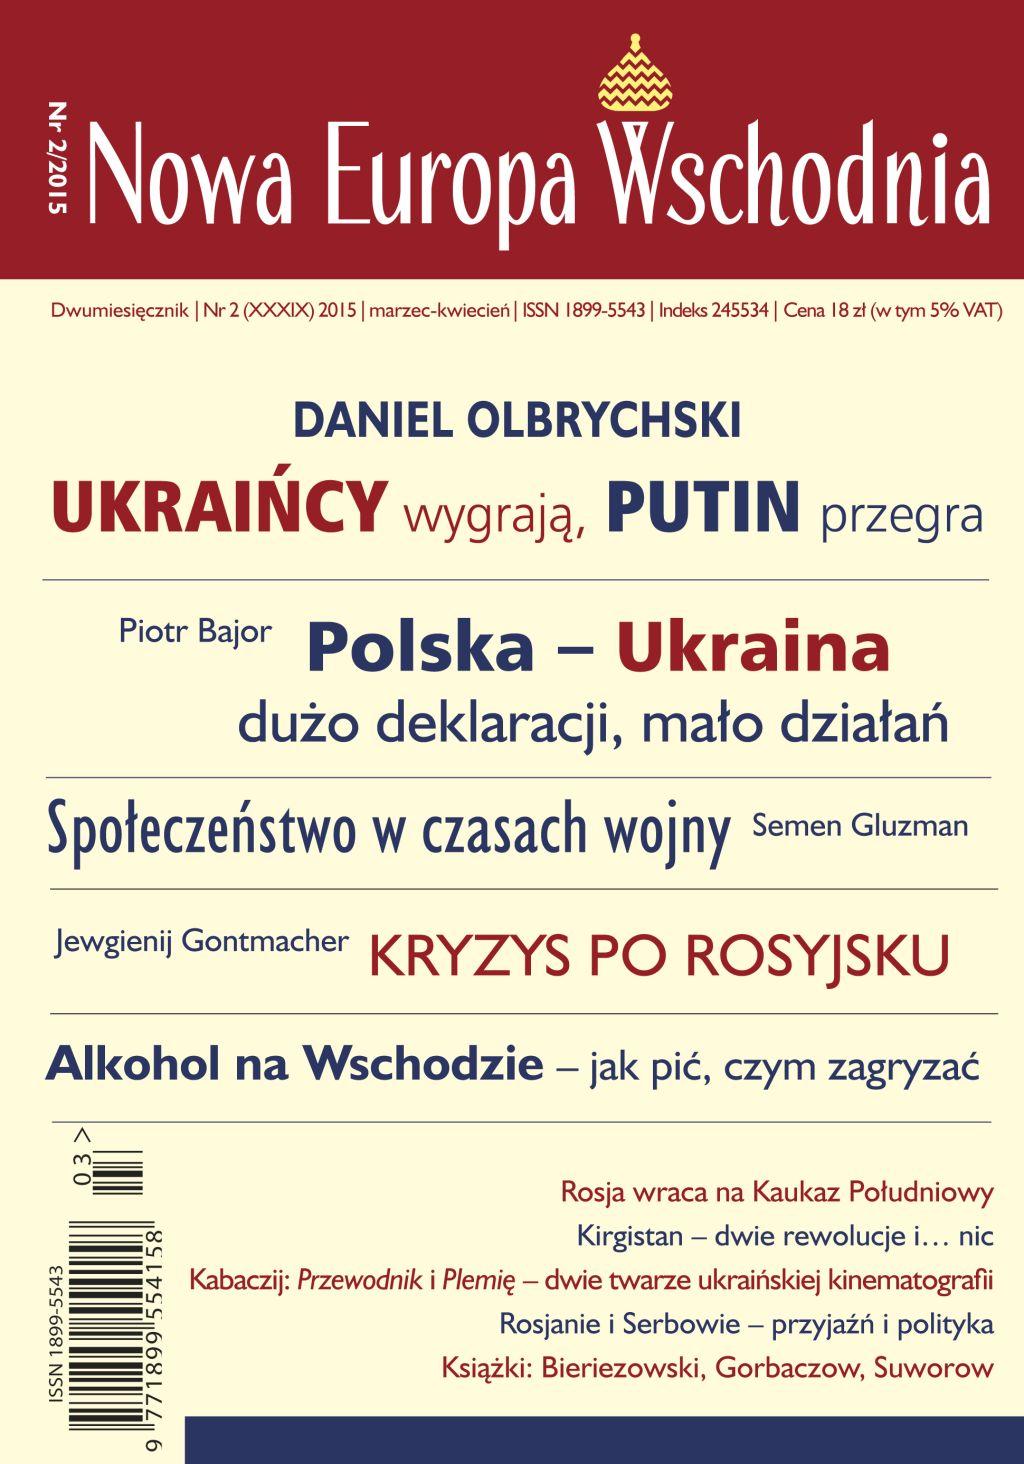 Nowa Europa Wschodnia, nr 2/2015